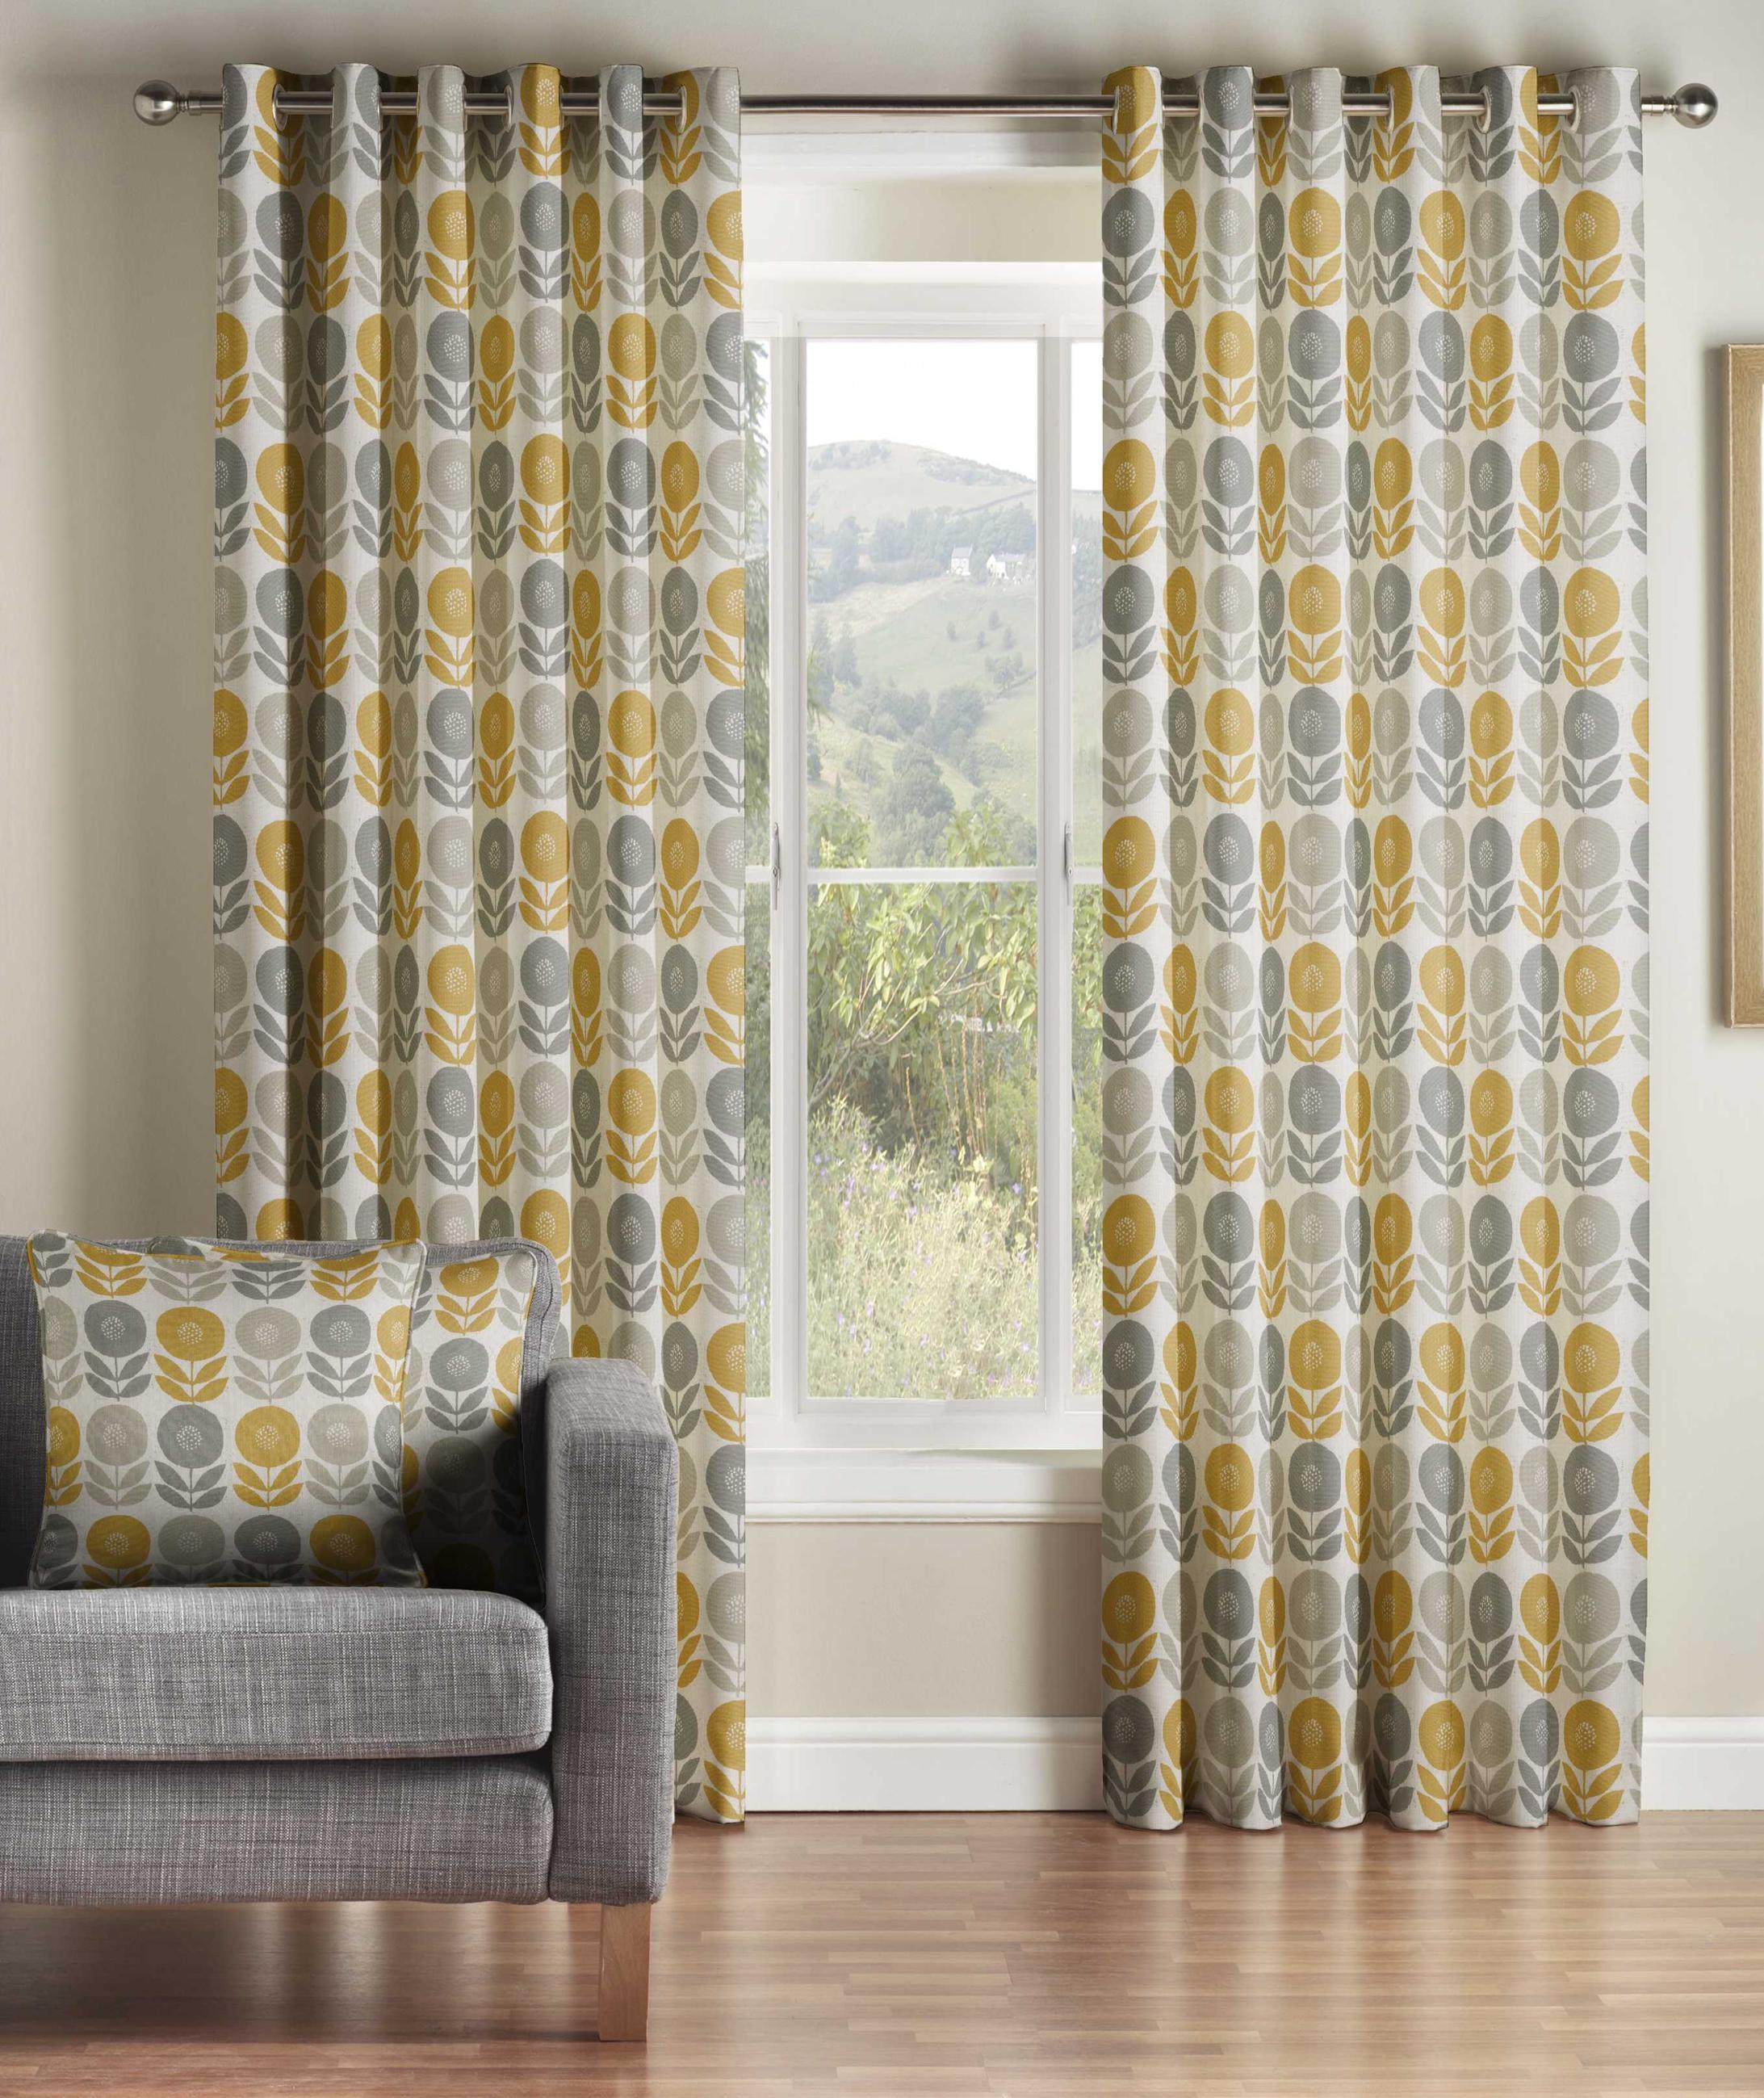 Uppsala Curtains Curtains At Home